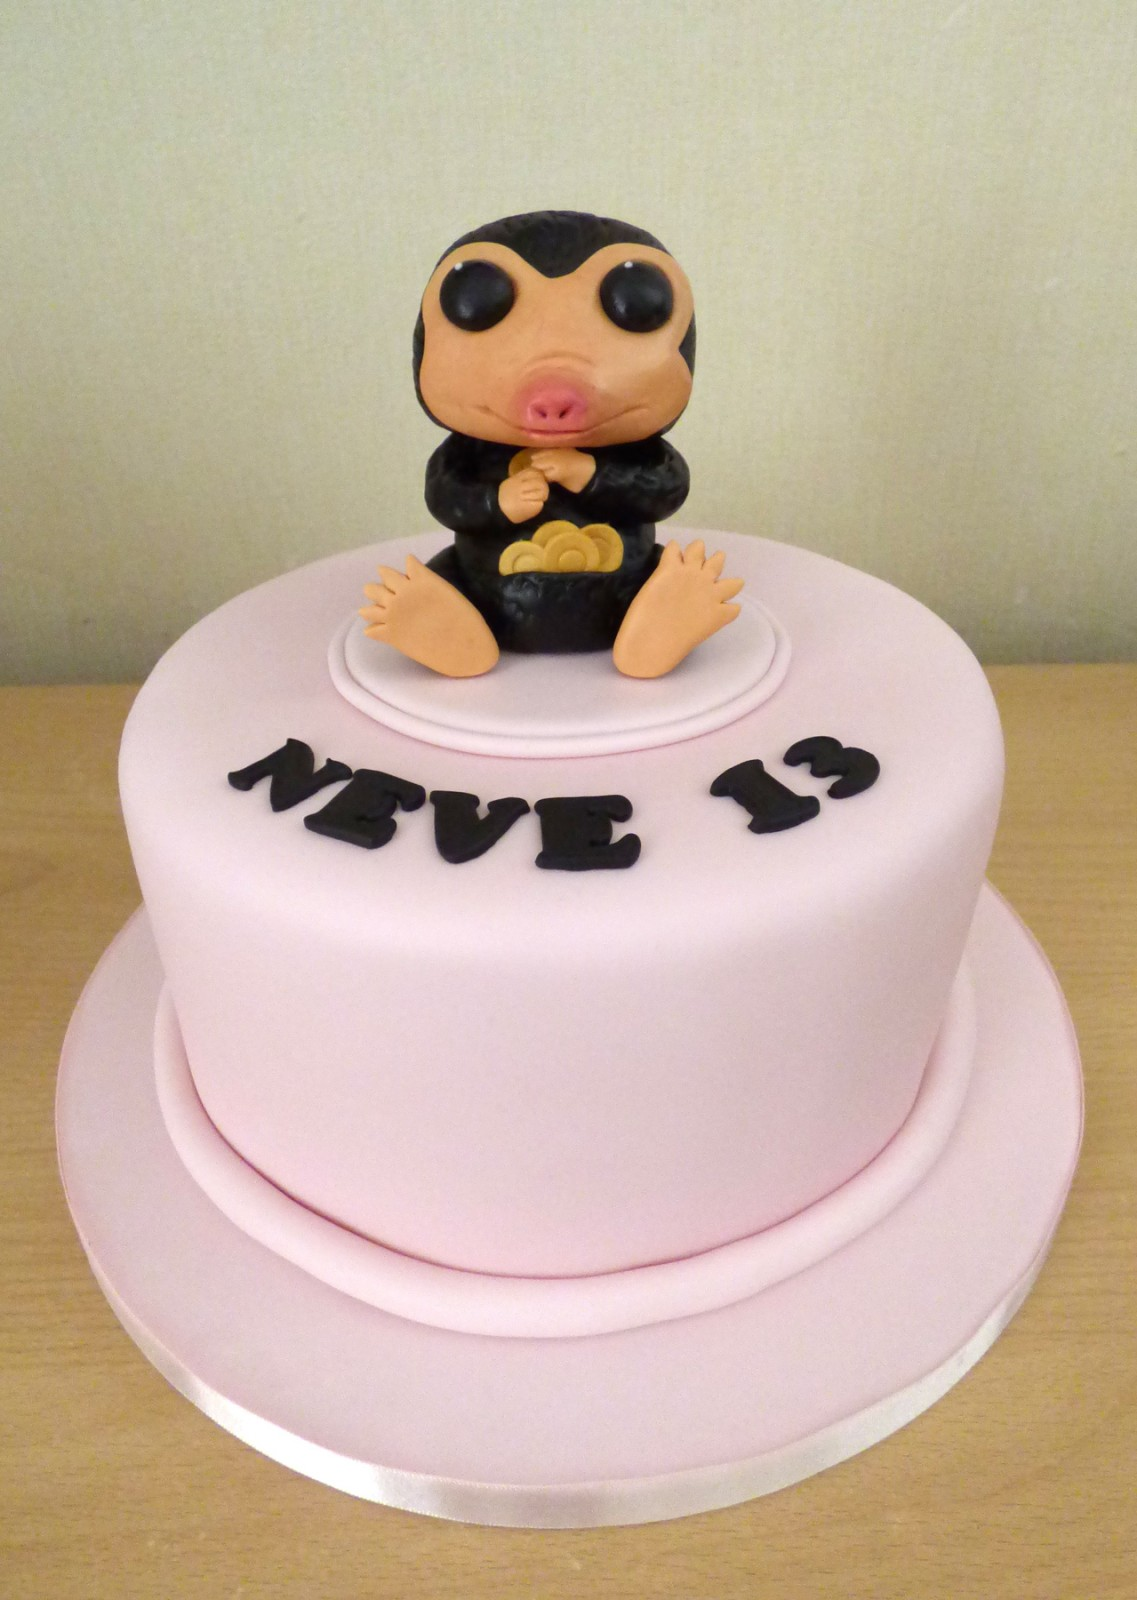 Outstanding Fantastic Beasts Niffler Birthday Cake Susies Cakes Personalised Birthday Cards Akebfashionlily Jamesorg